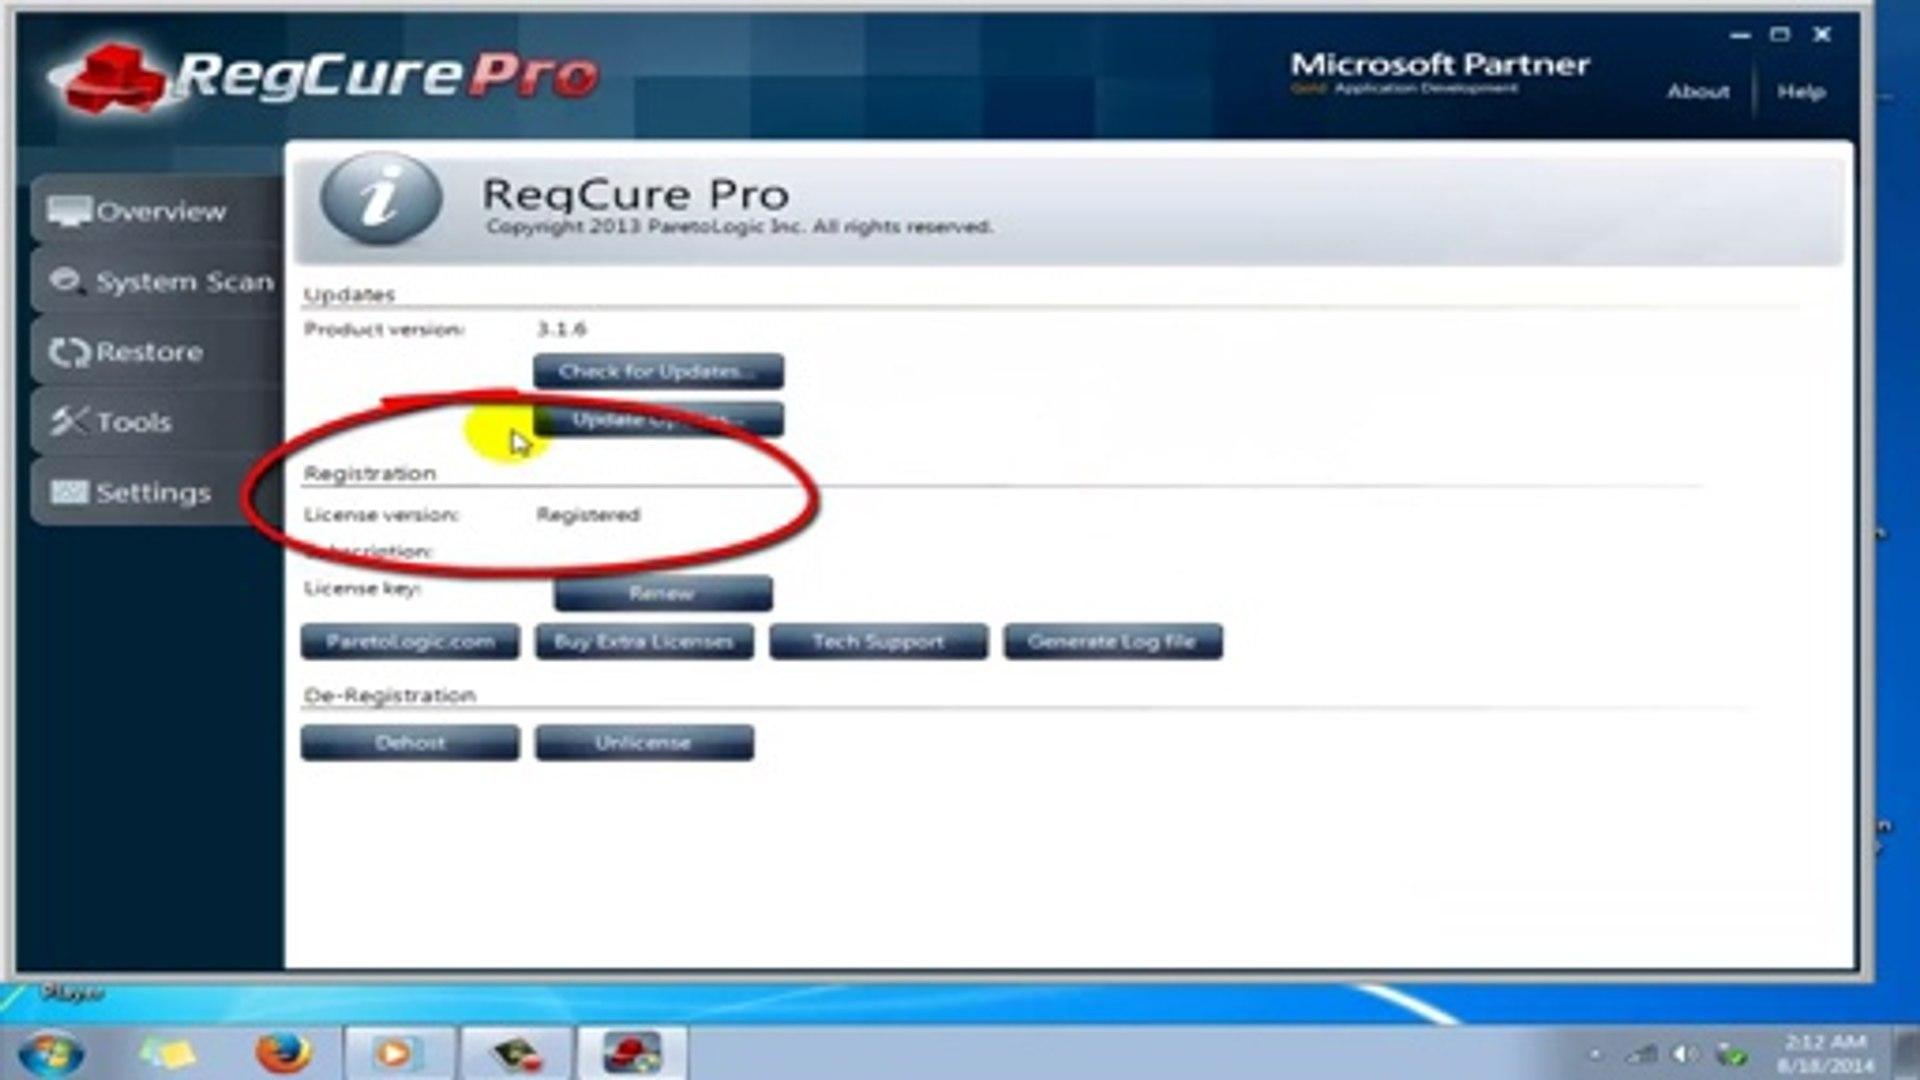 regcure pro 3.2.16 license key